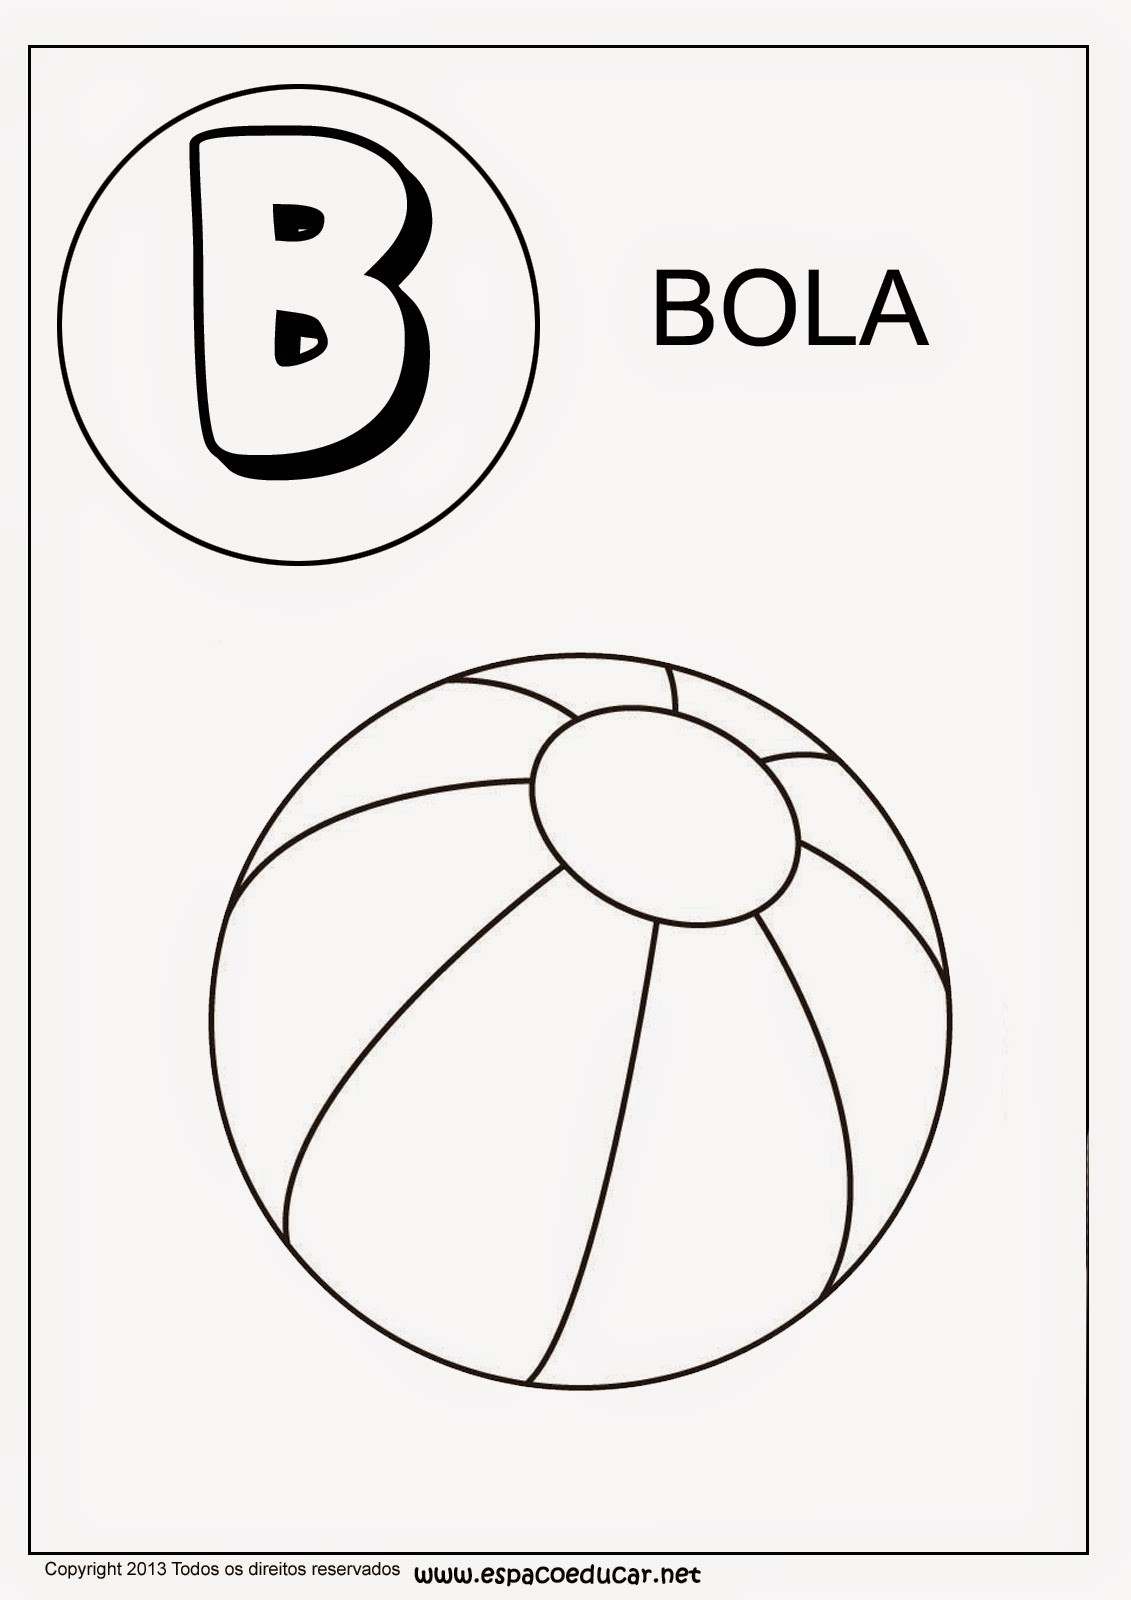 Alfabeto De Colorir Alfabeto Para Colorir Pintar Imprimir Ou